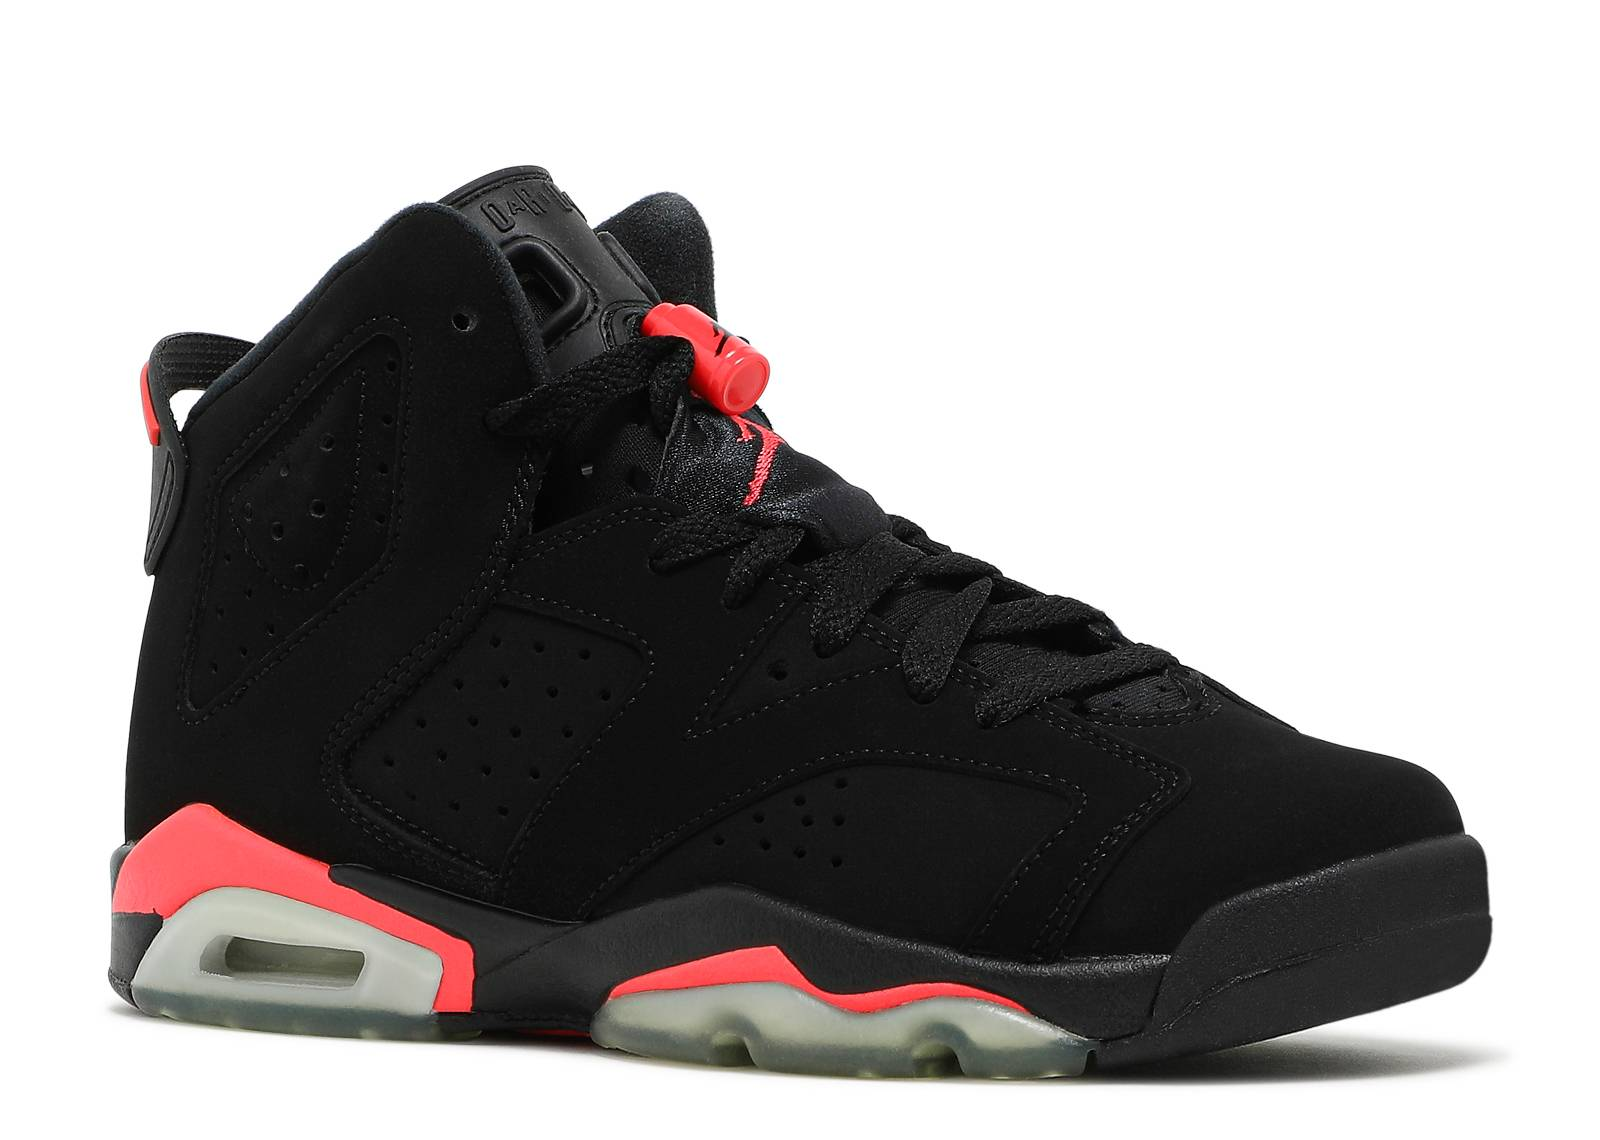 Nike BG GS Air Jordan 6 Black Infrared Trainer Size 3 UK